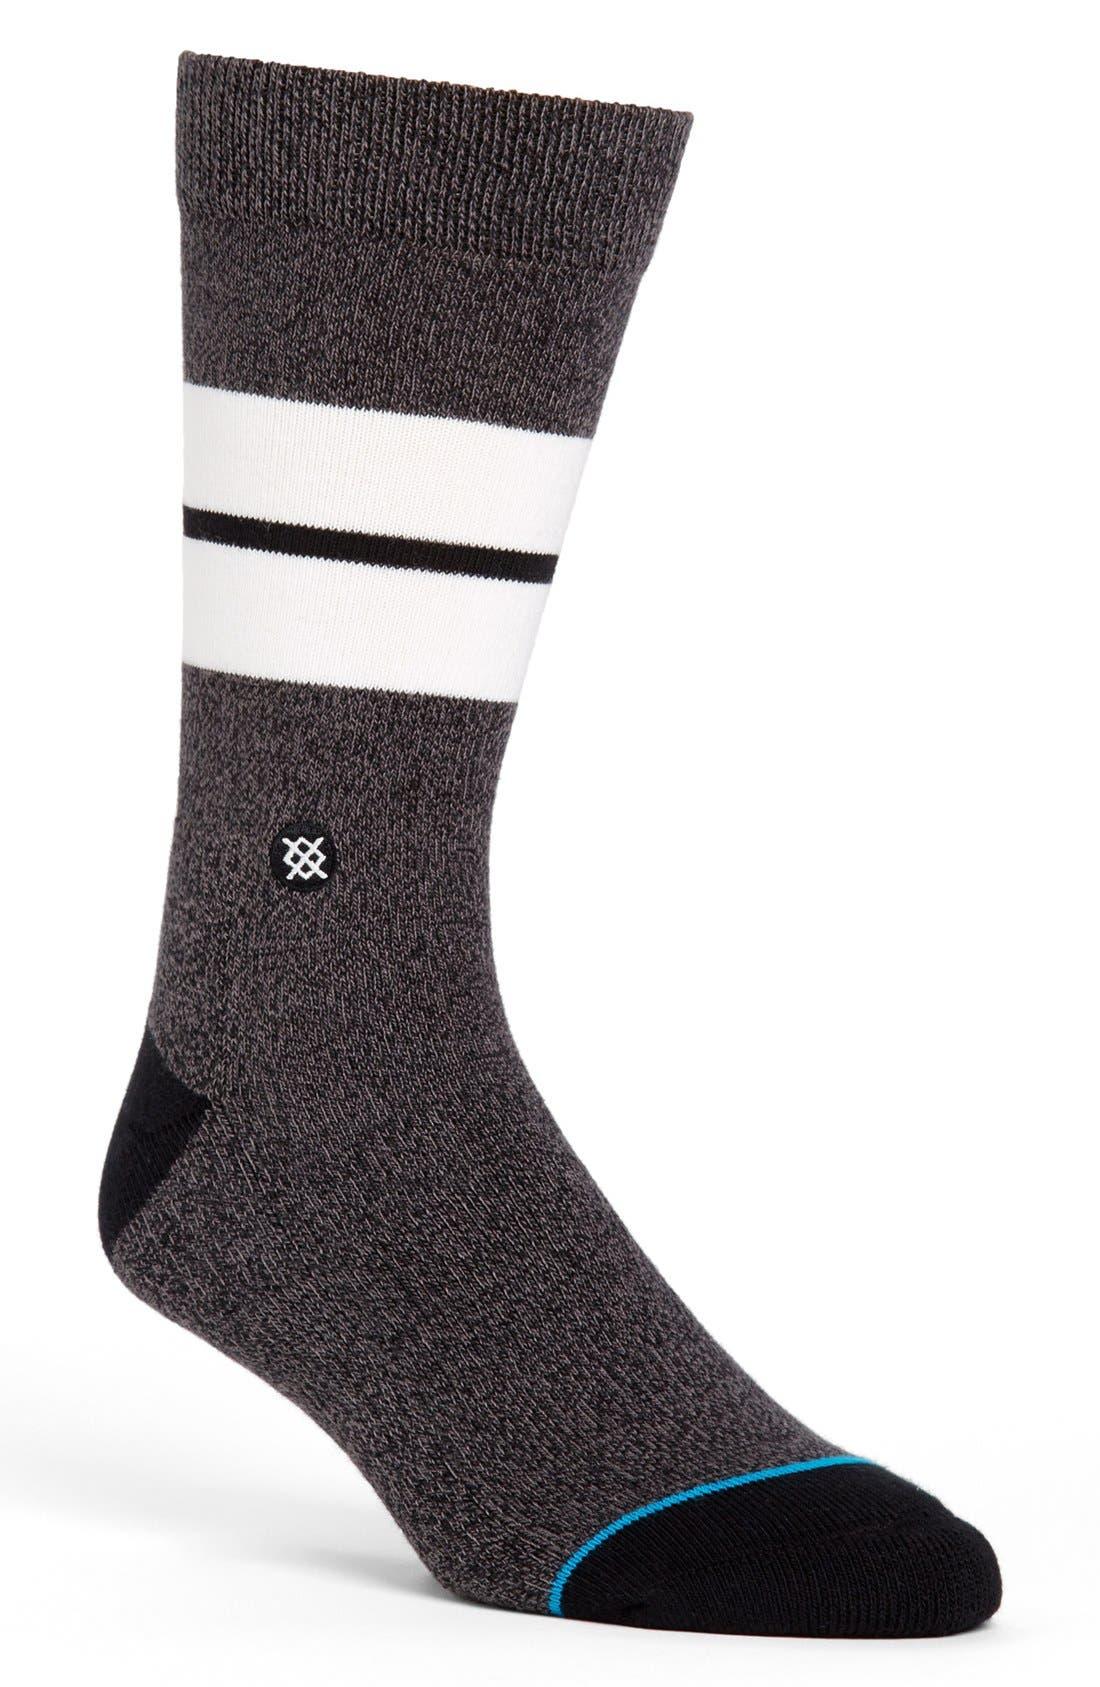 Alternate Image 1 Selected - Stance 'Sequoia' Socks